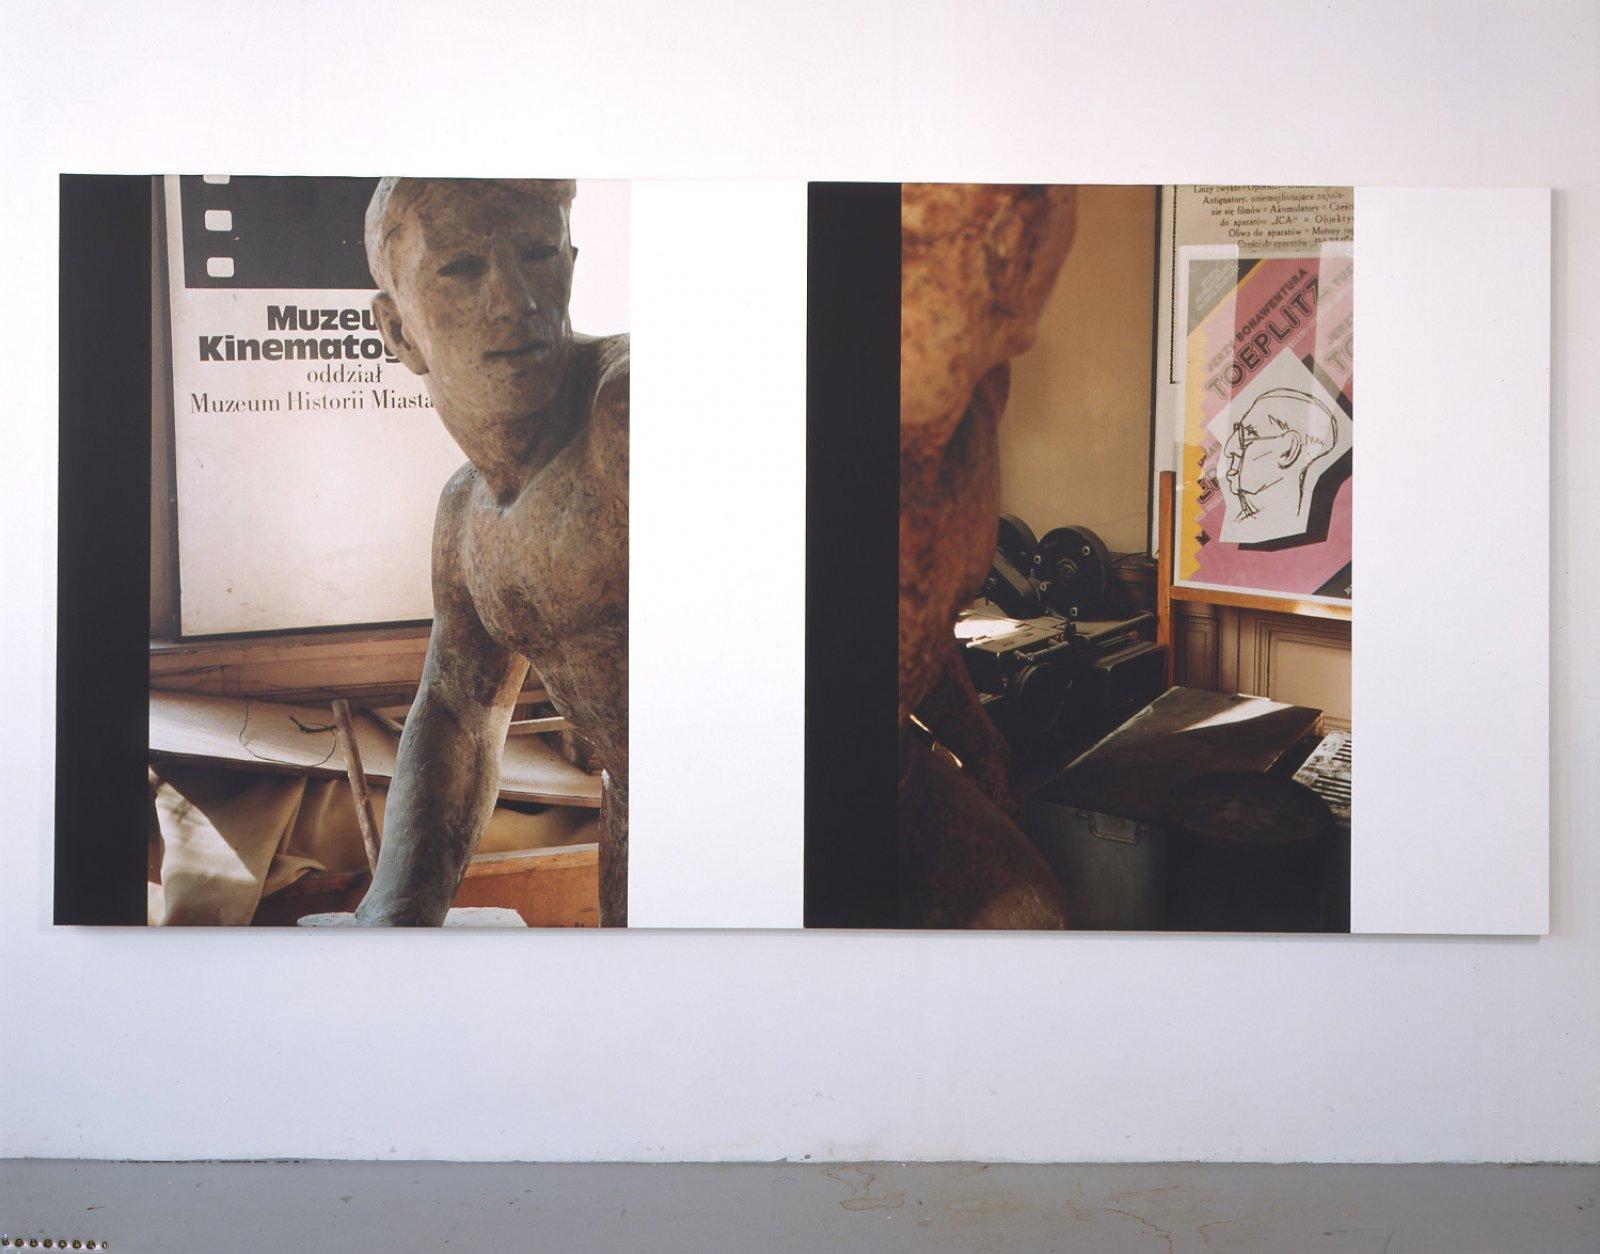 Ian Wallace,The Cinema Museum, Lodz, 1991,60 x 120 in. (152 x 304 cm)